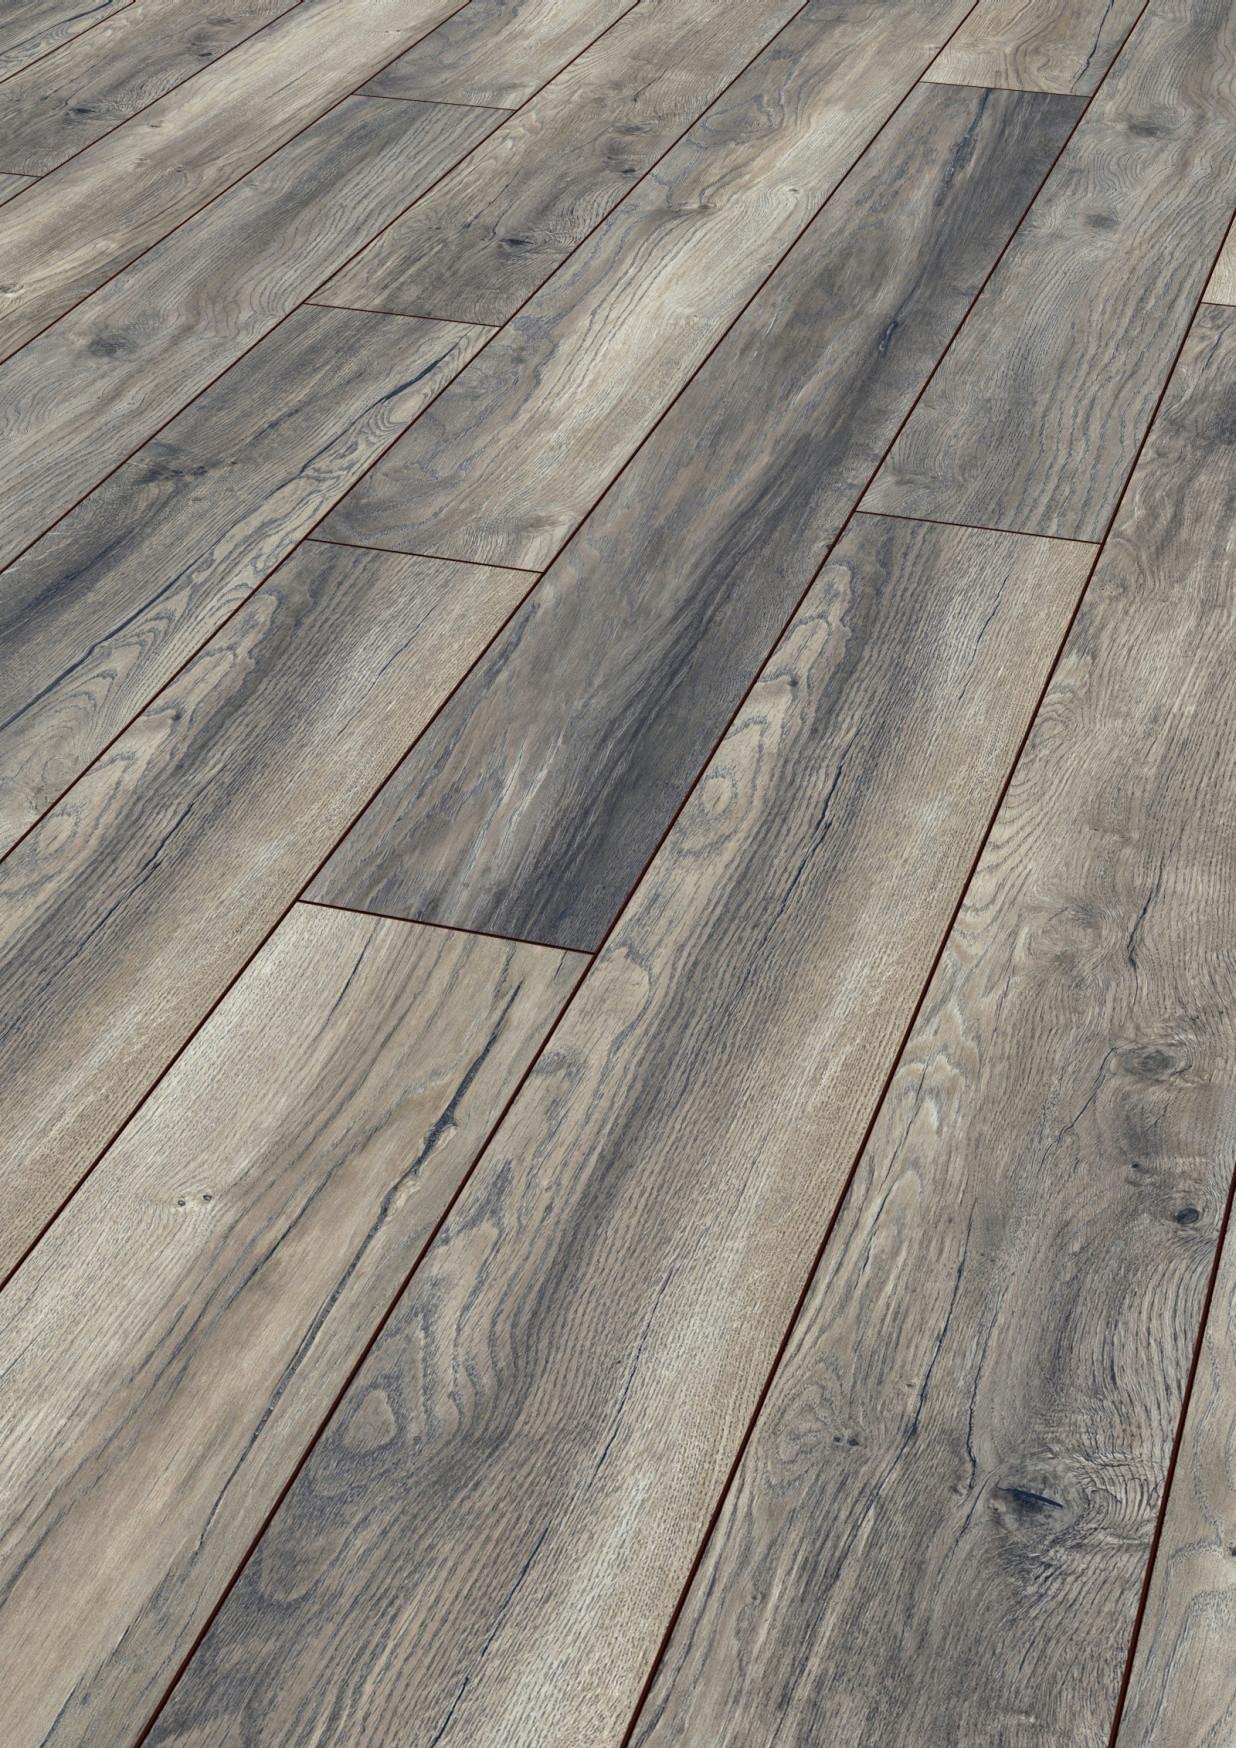 clearance hardwood flooring toronto of 26 beautiful solid wood flooring wlcu with related posts 30 elegant floating engineered wood flooring